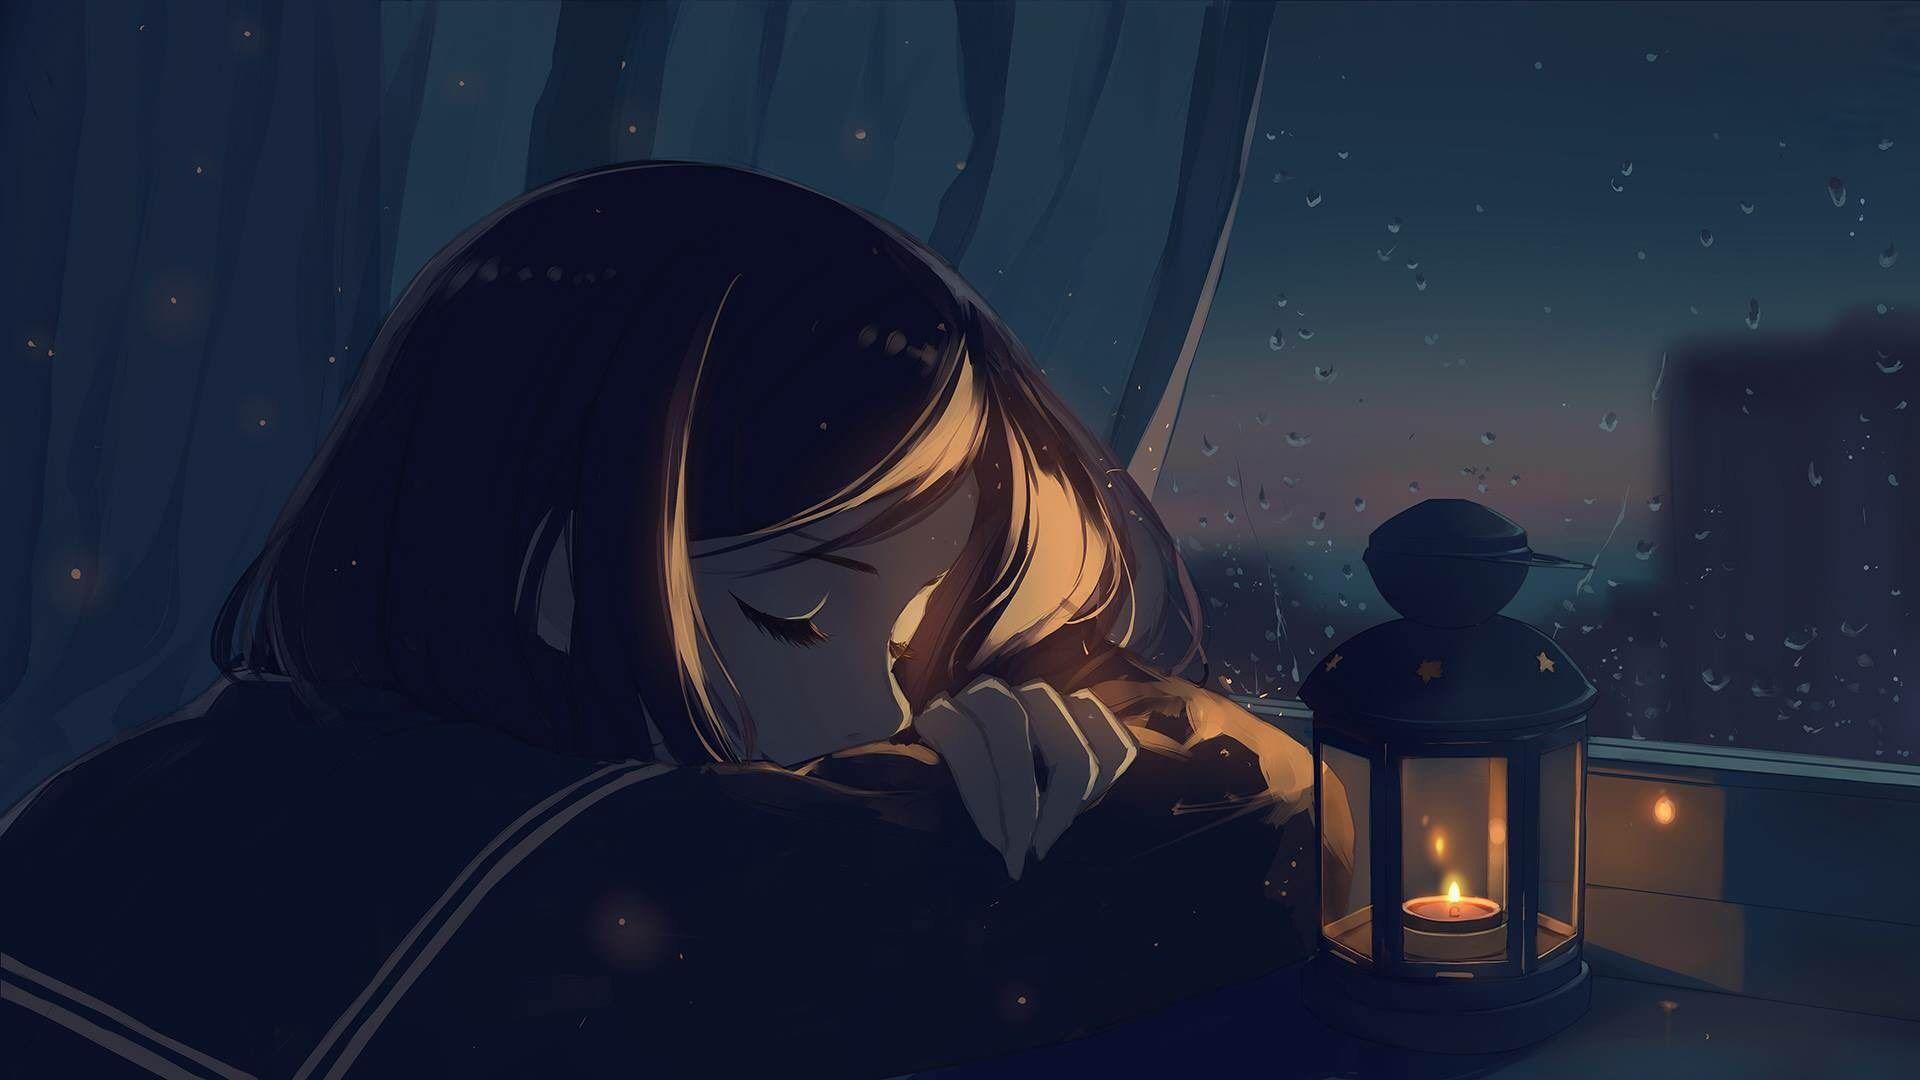 Falling Asleep Original Anime Scenery Anime Art Beautiful Anime Scenery Wallpaper